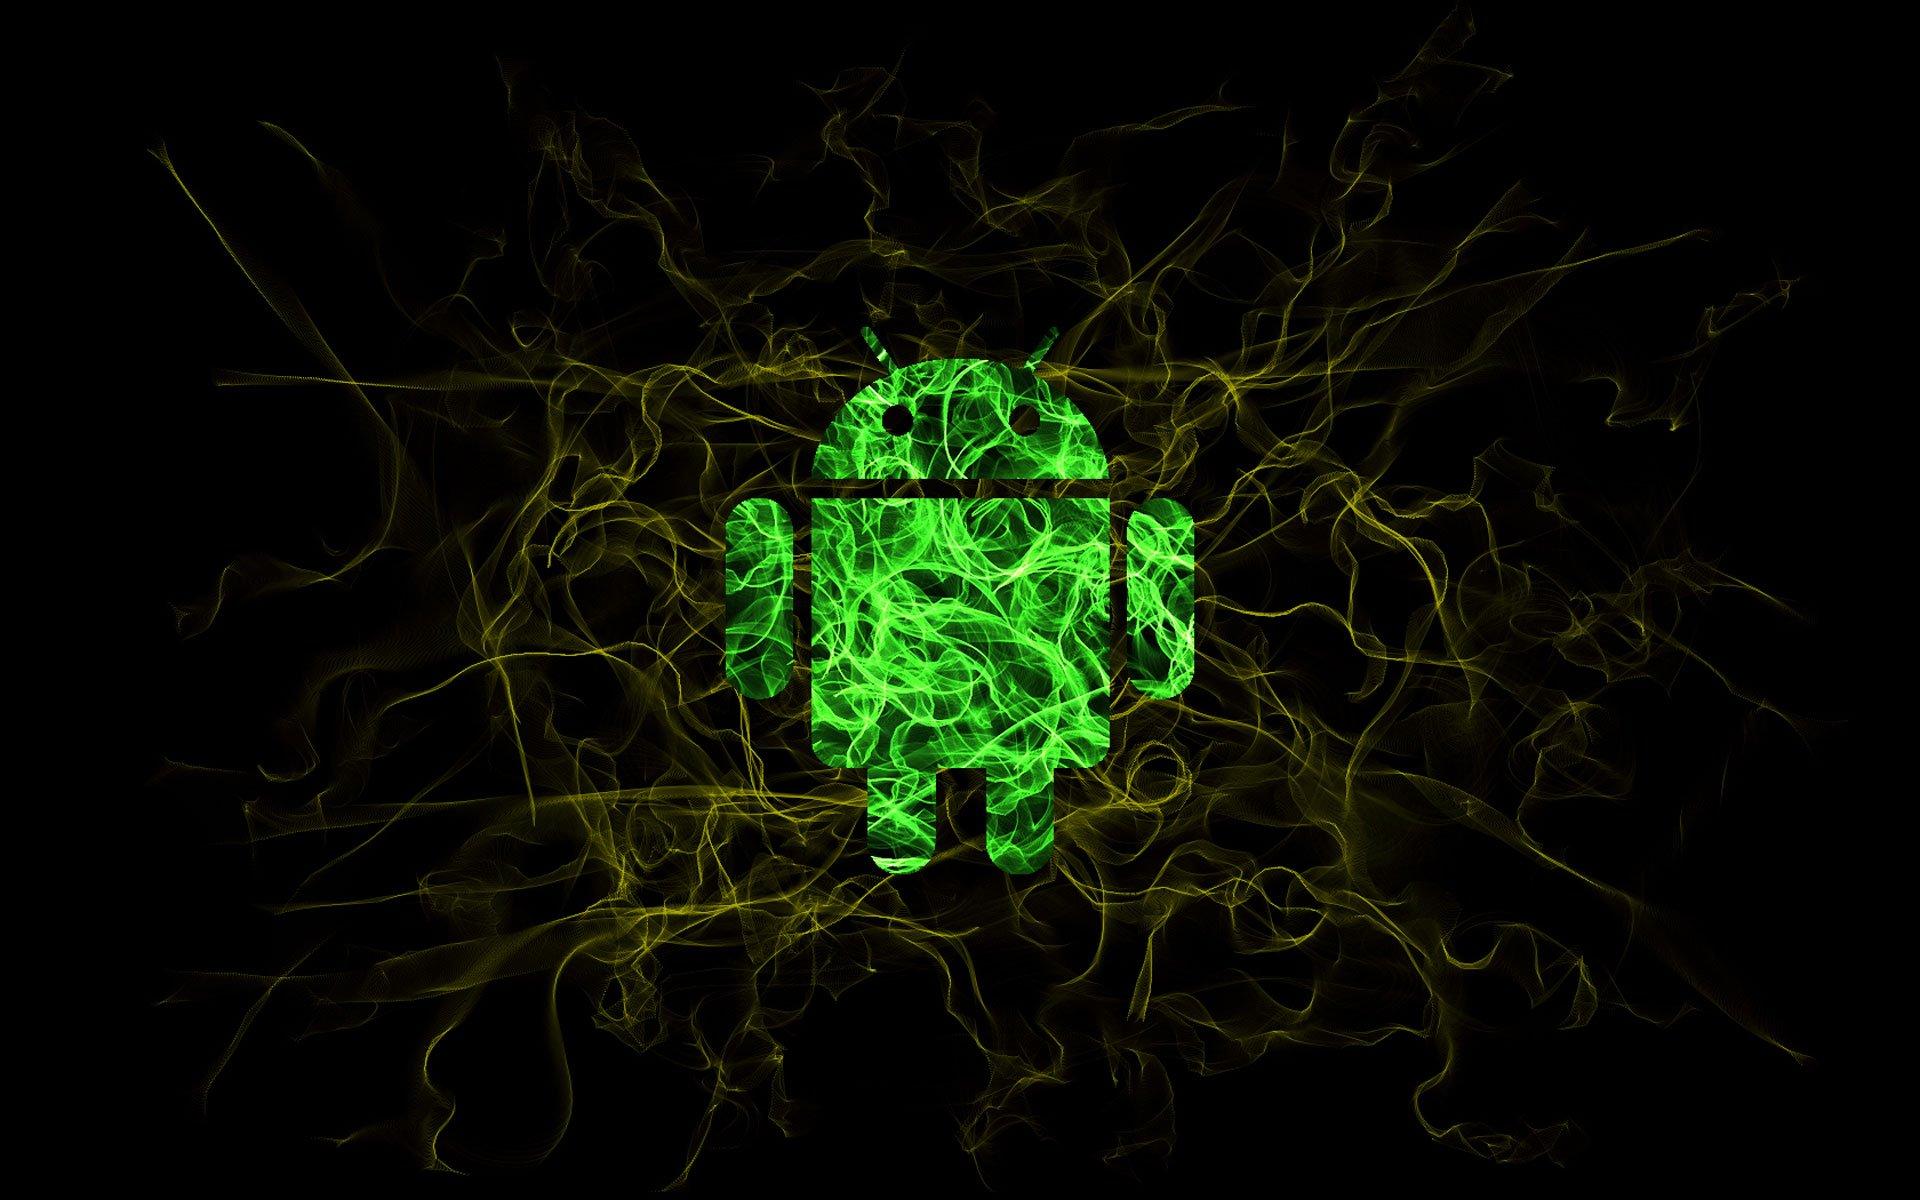 Anarchy computer cyber hacker hacking virus dark sadic for Sfondi hd android